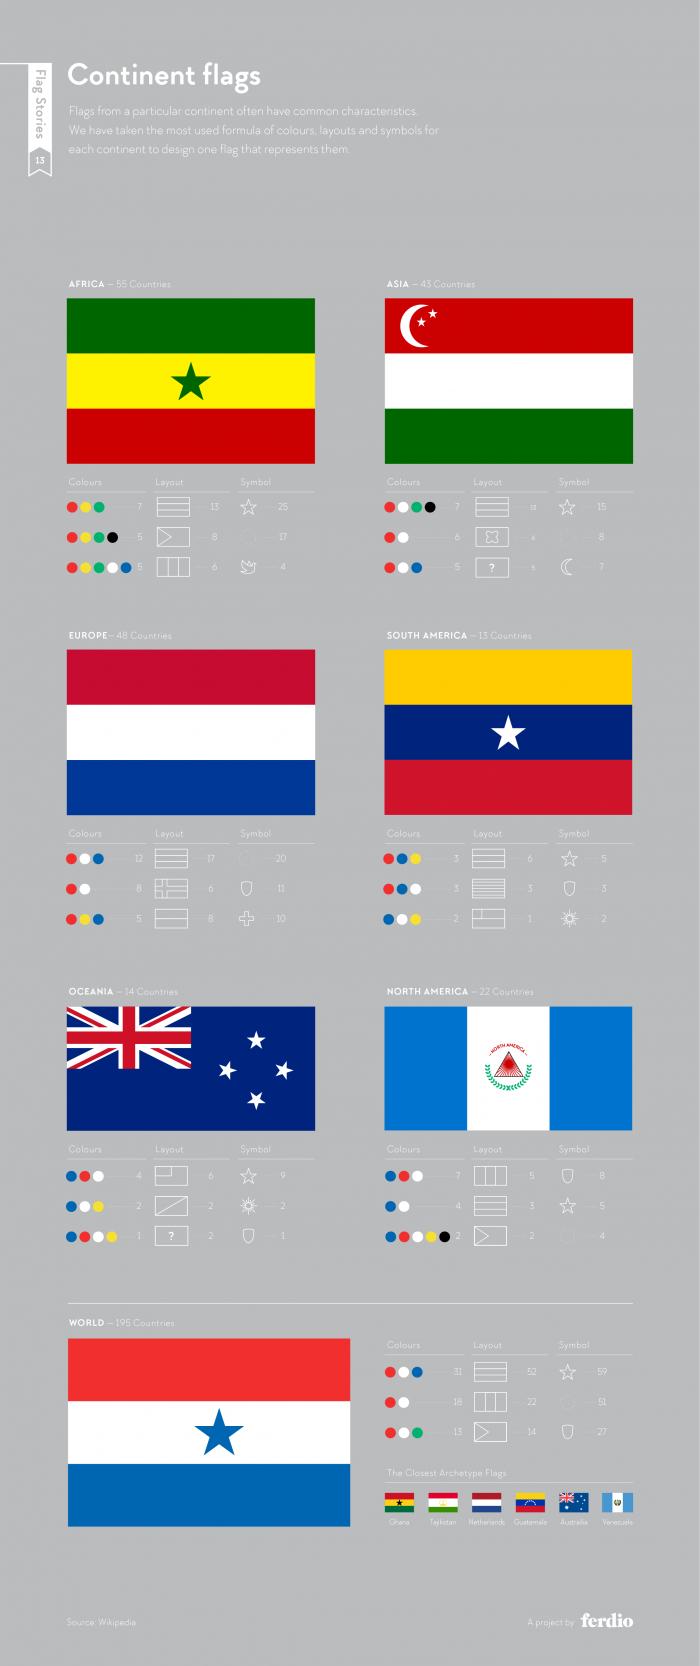 The Hidden Graphic Design Behind Flags Design Indaba